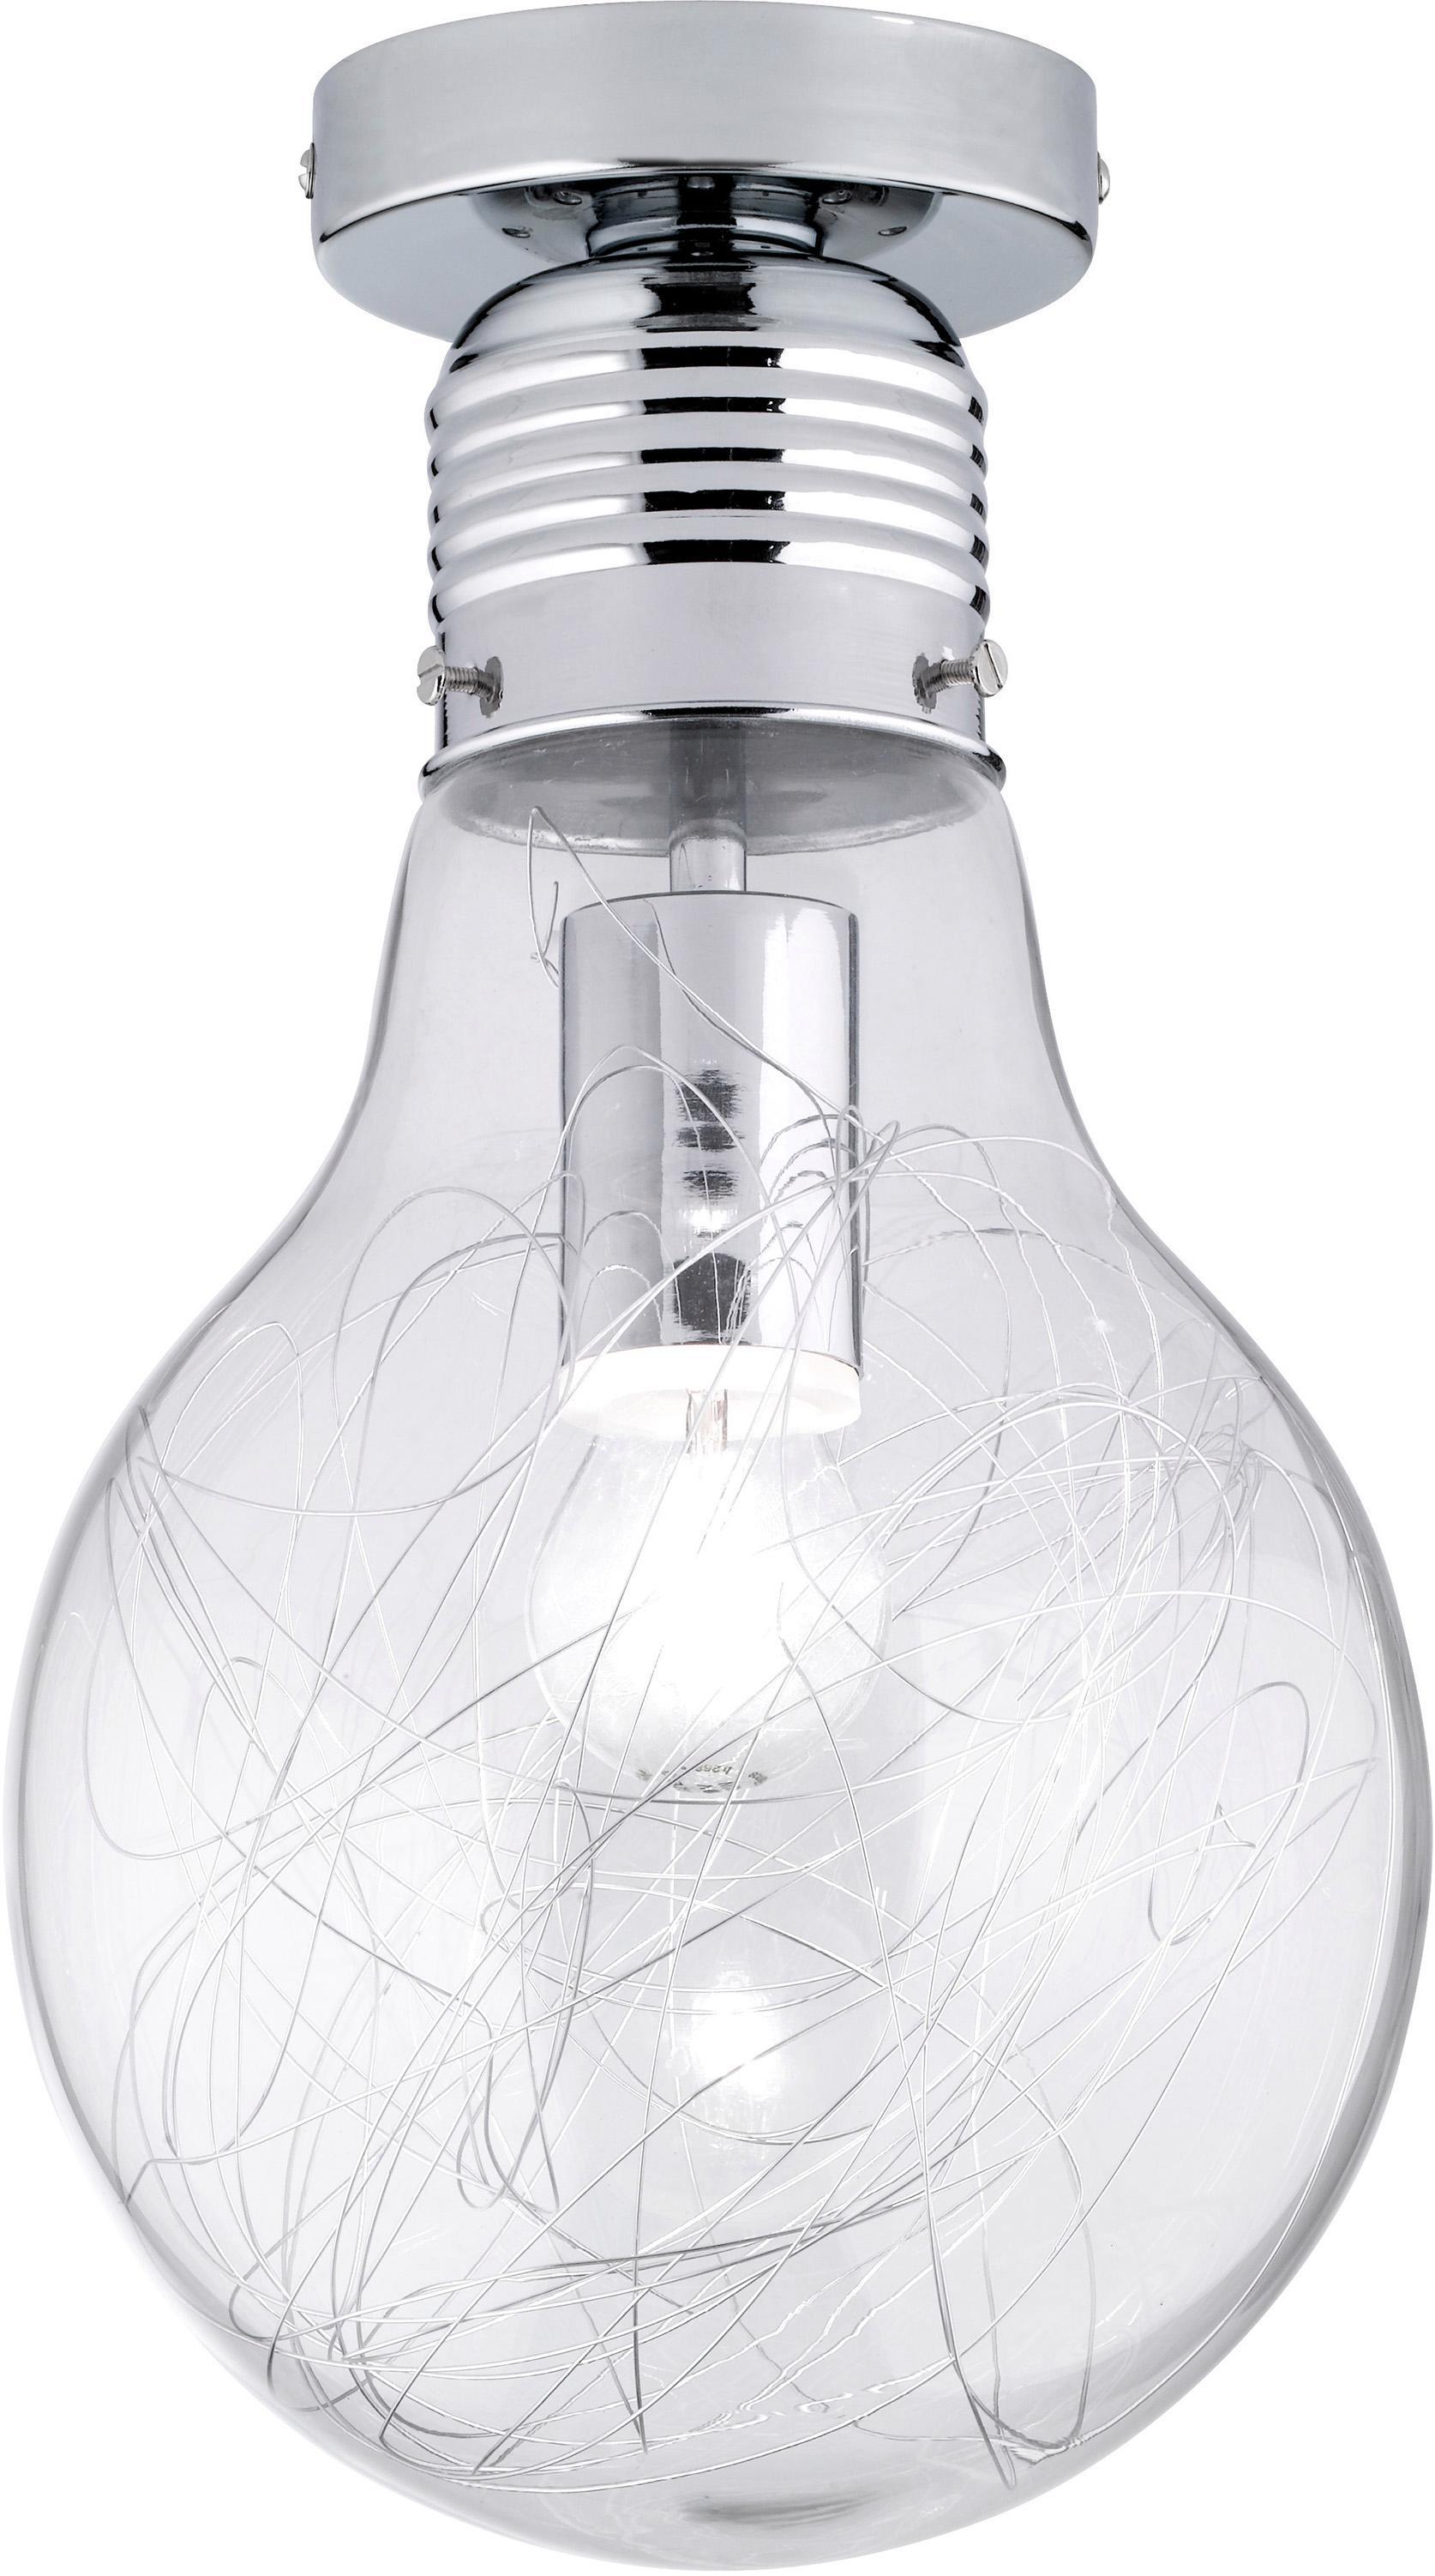 WOFI Deckenleuchte FUTURA, E27, Deckenlampe